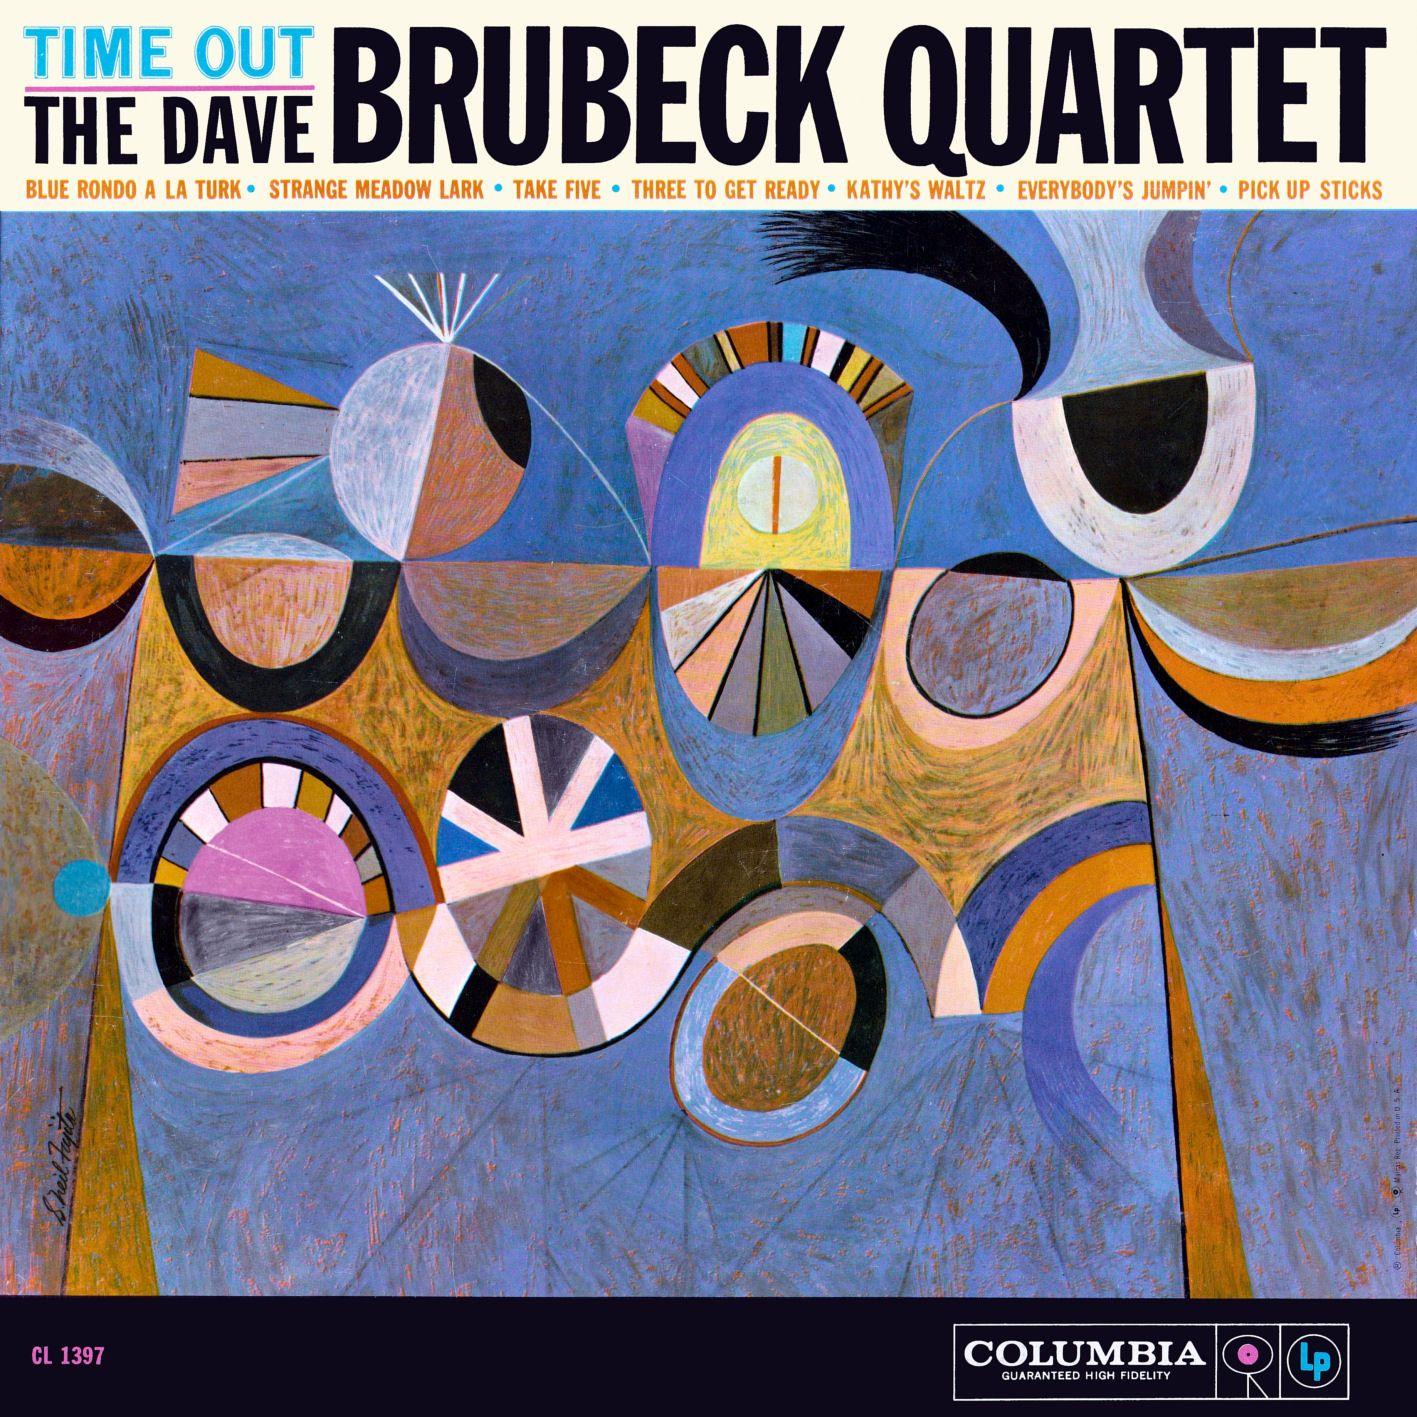 The Dave Brubeck Quartet Quot Time Out Quot Lp Cover Full